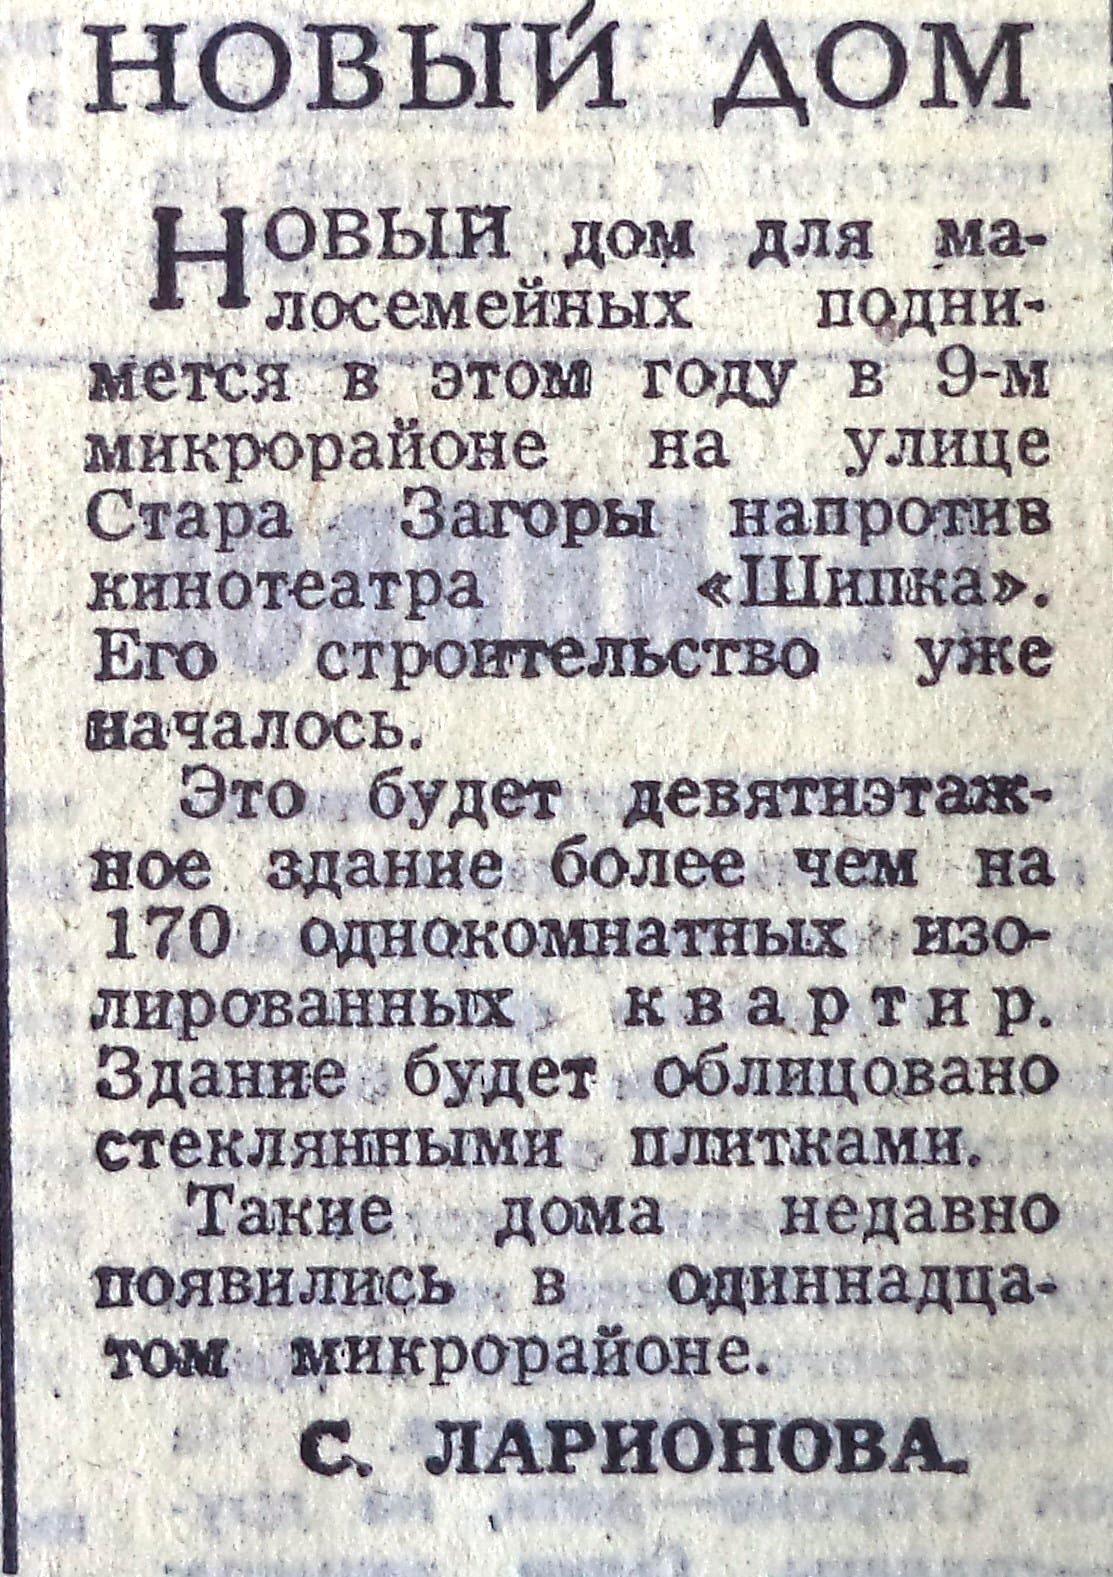 Стара Загора-ФОТО-013-ВЗя-1977-02-07-буд. малосем. дом напротив Шипки-min